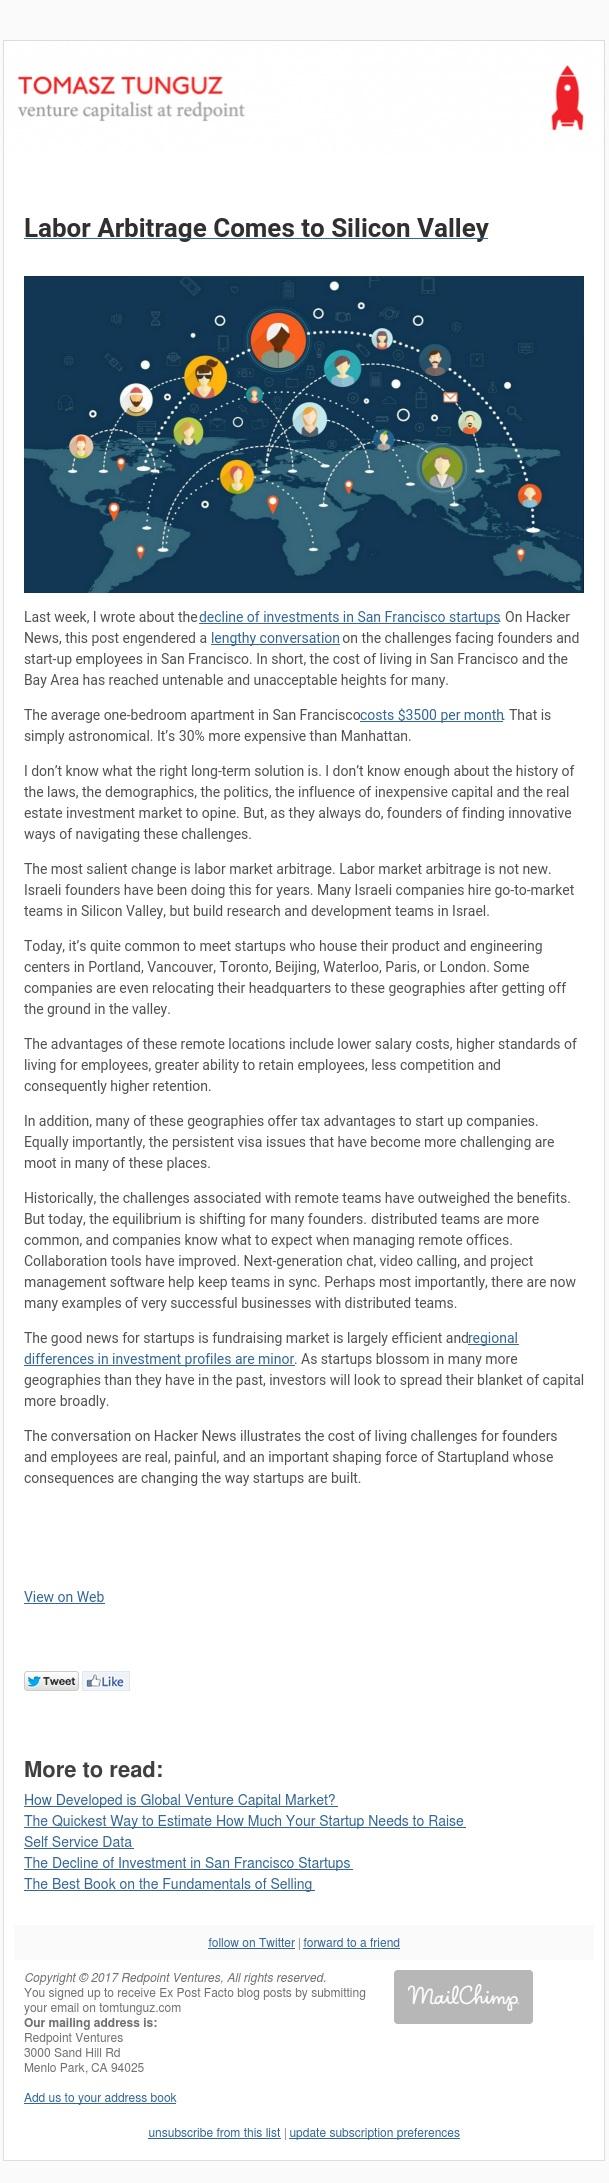 Labor Arbitrage Comes to Silicon Valley